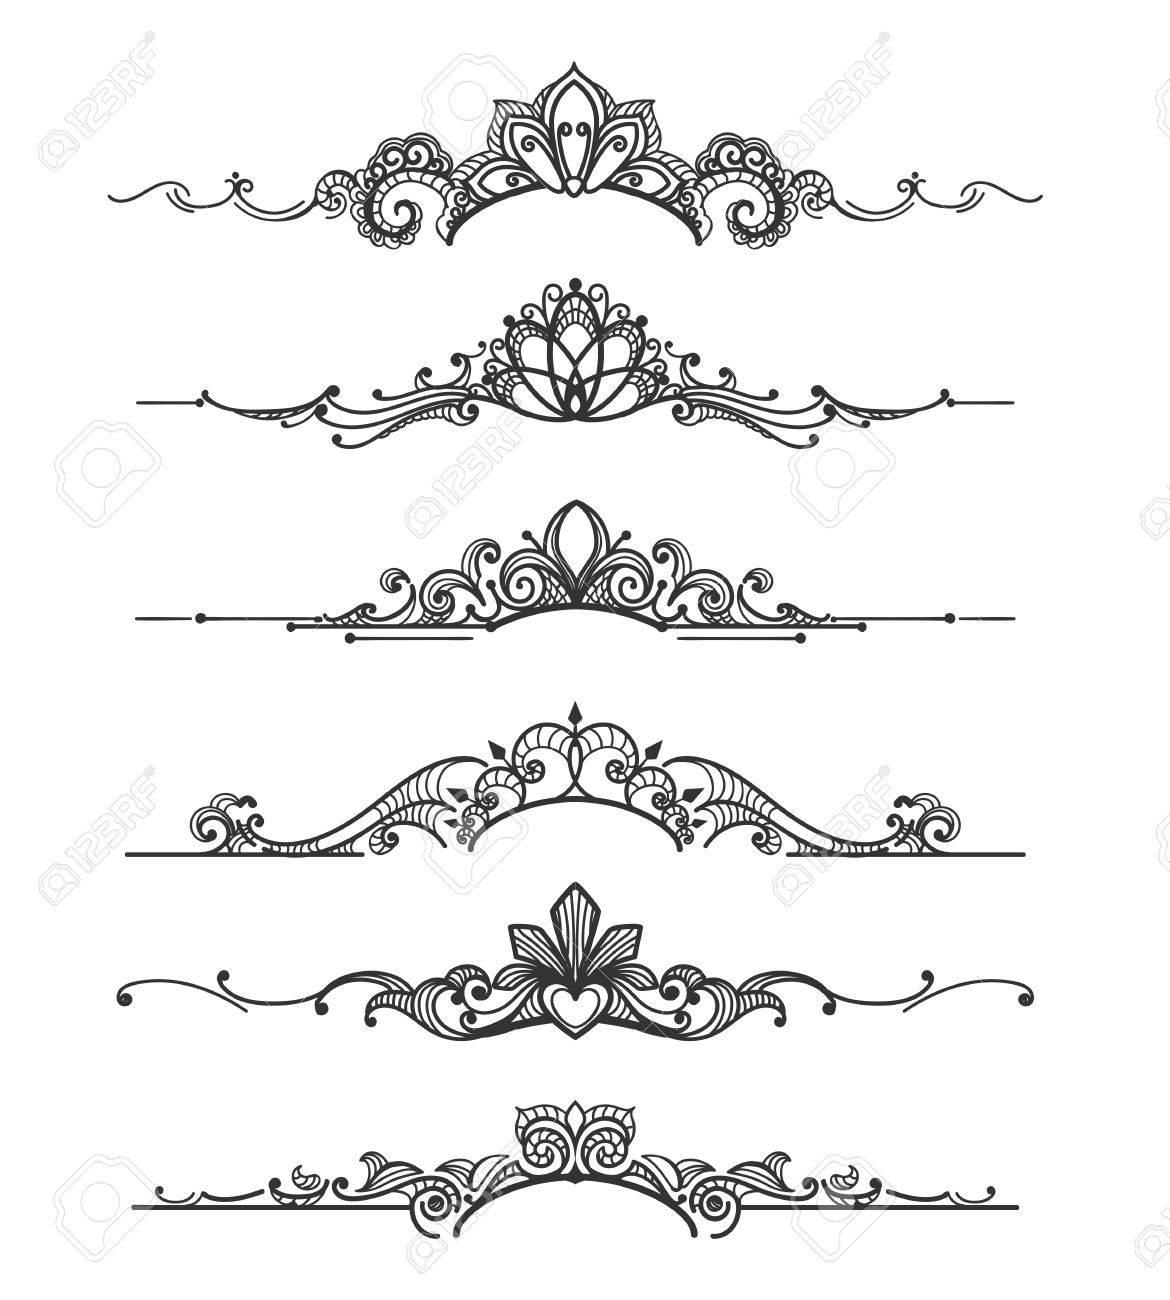 Floral design crown calligraphic elements linear royal tiara floral design crown calligraphic elements linear royal tiara curly vector dividers for elegant wedding flourish stopboris Gallery